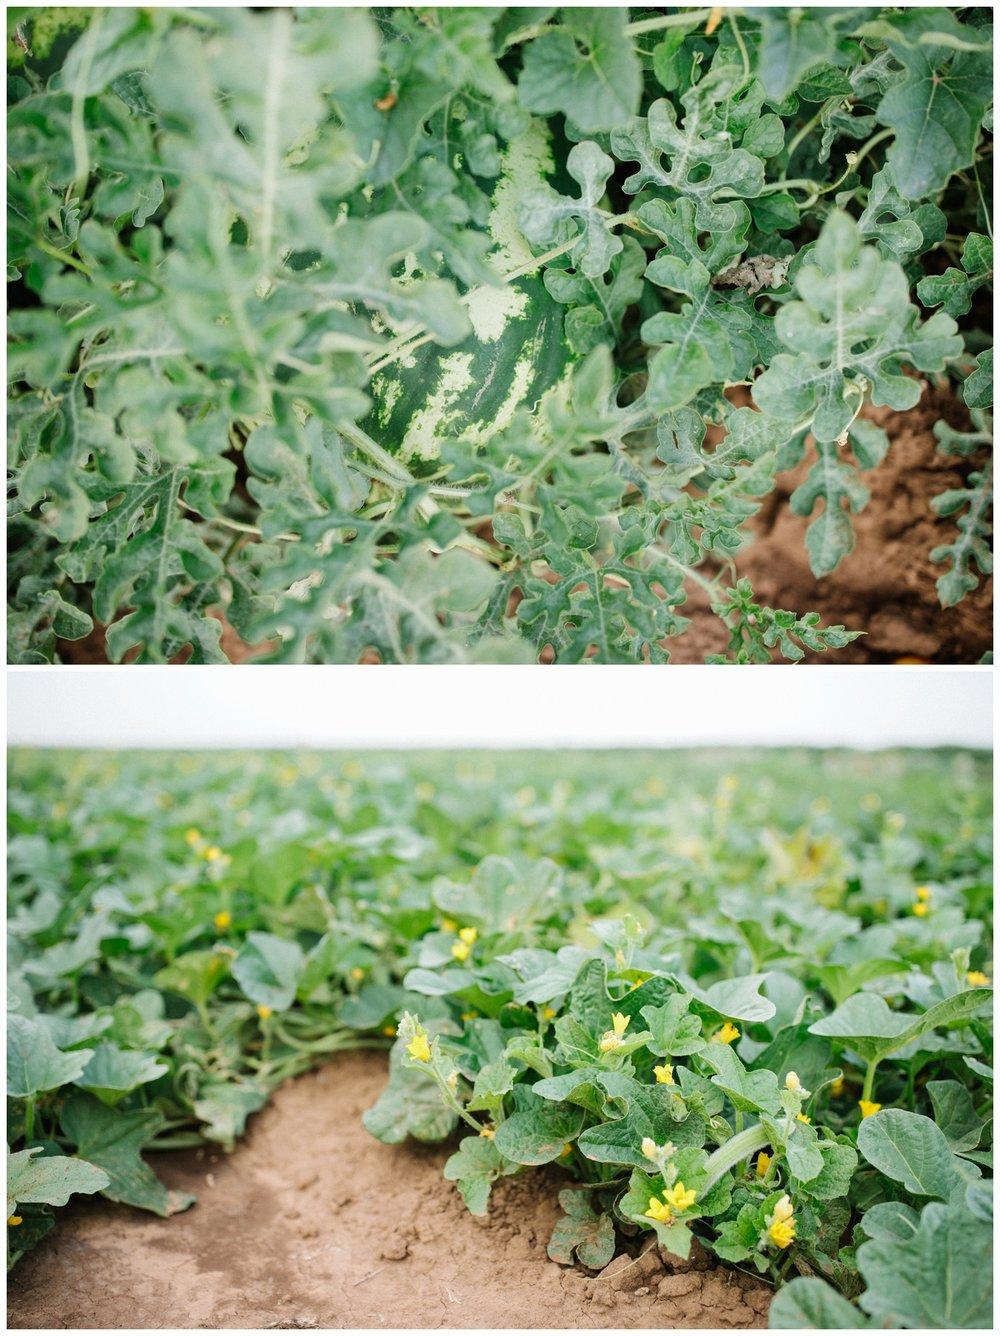 Reimer Farms__Lubbock Texas produce garden_04.jpg